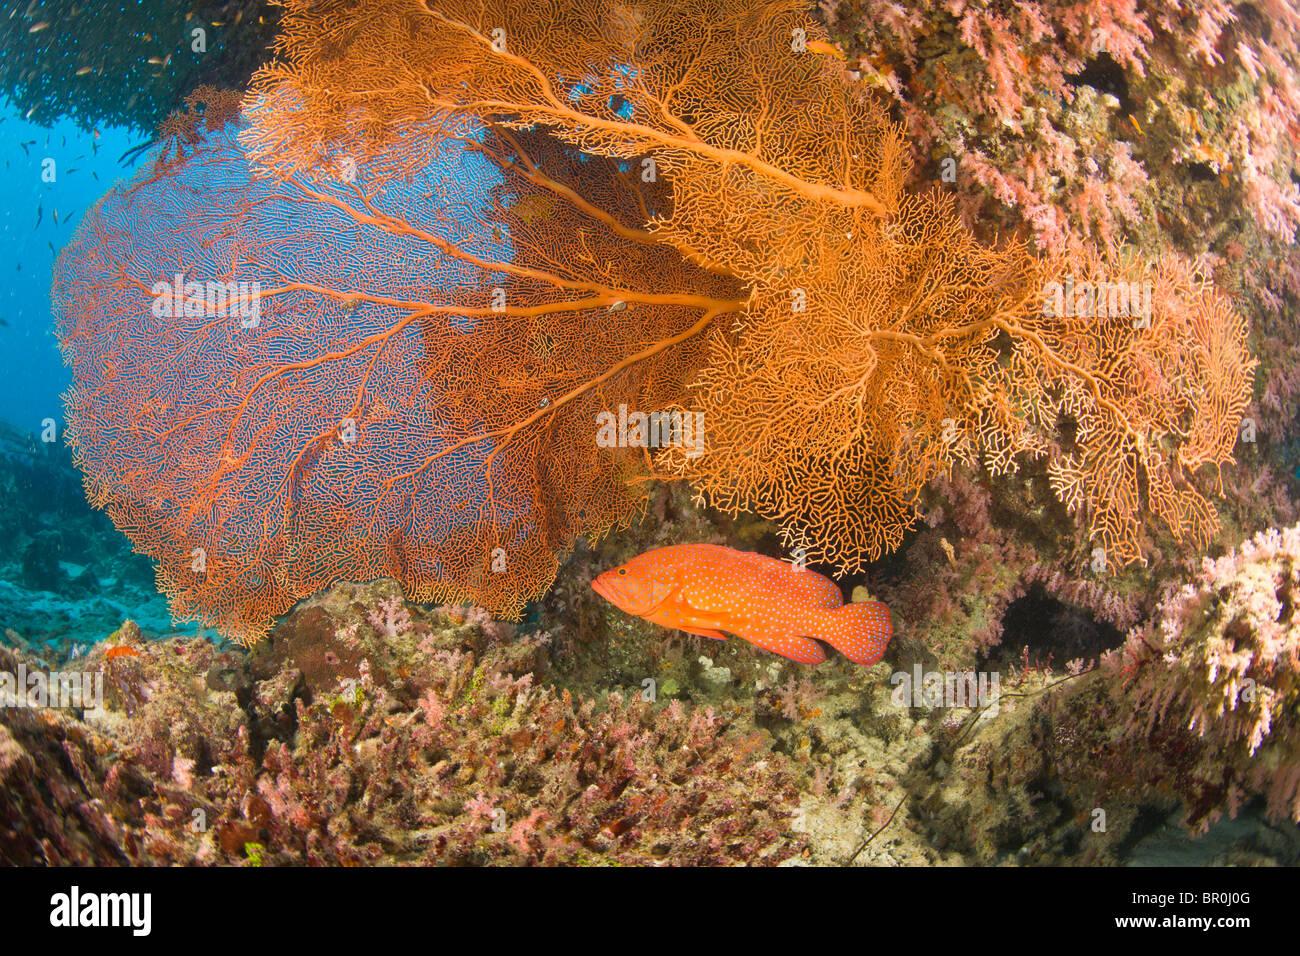 Coral Grouper (Cephalopholis miniata), scuba diving at Similan Islands Underwater Park, Thailand, SE Asia Stock Photo